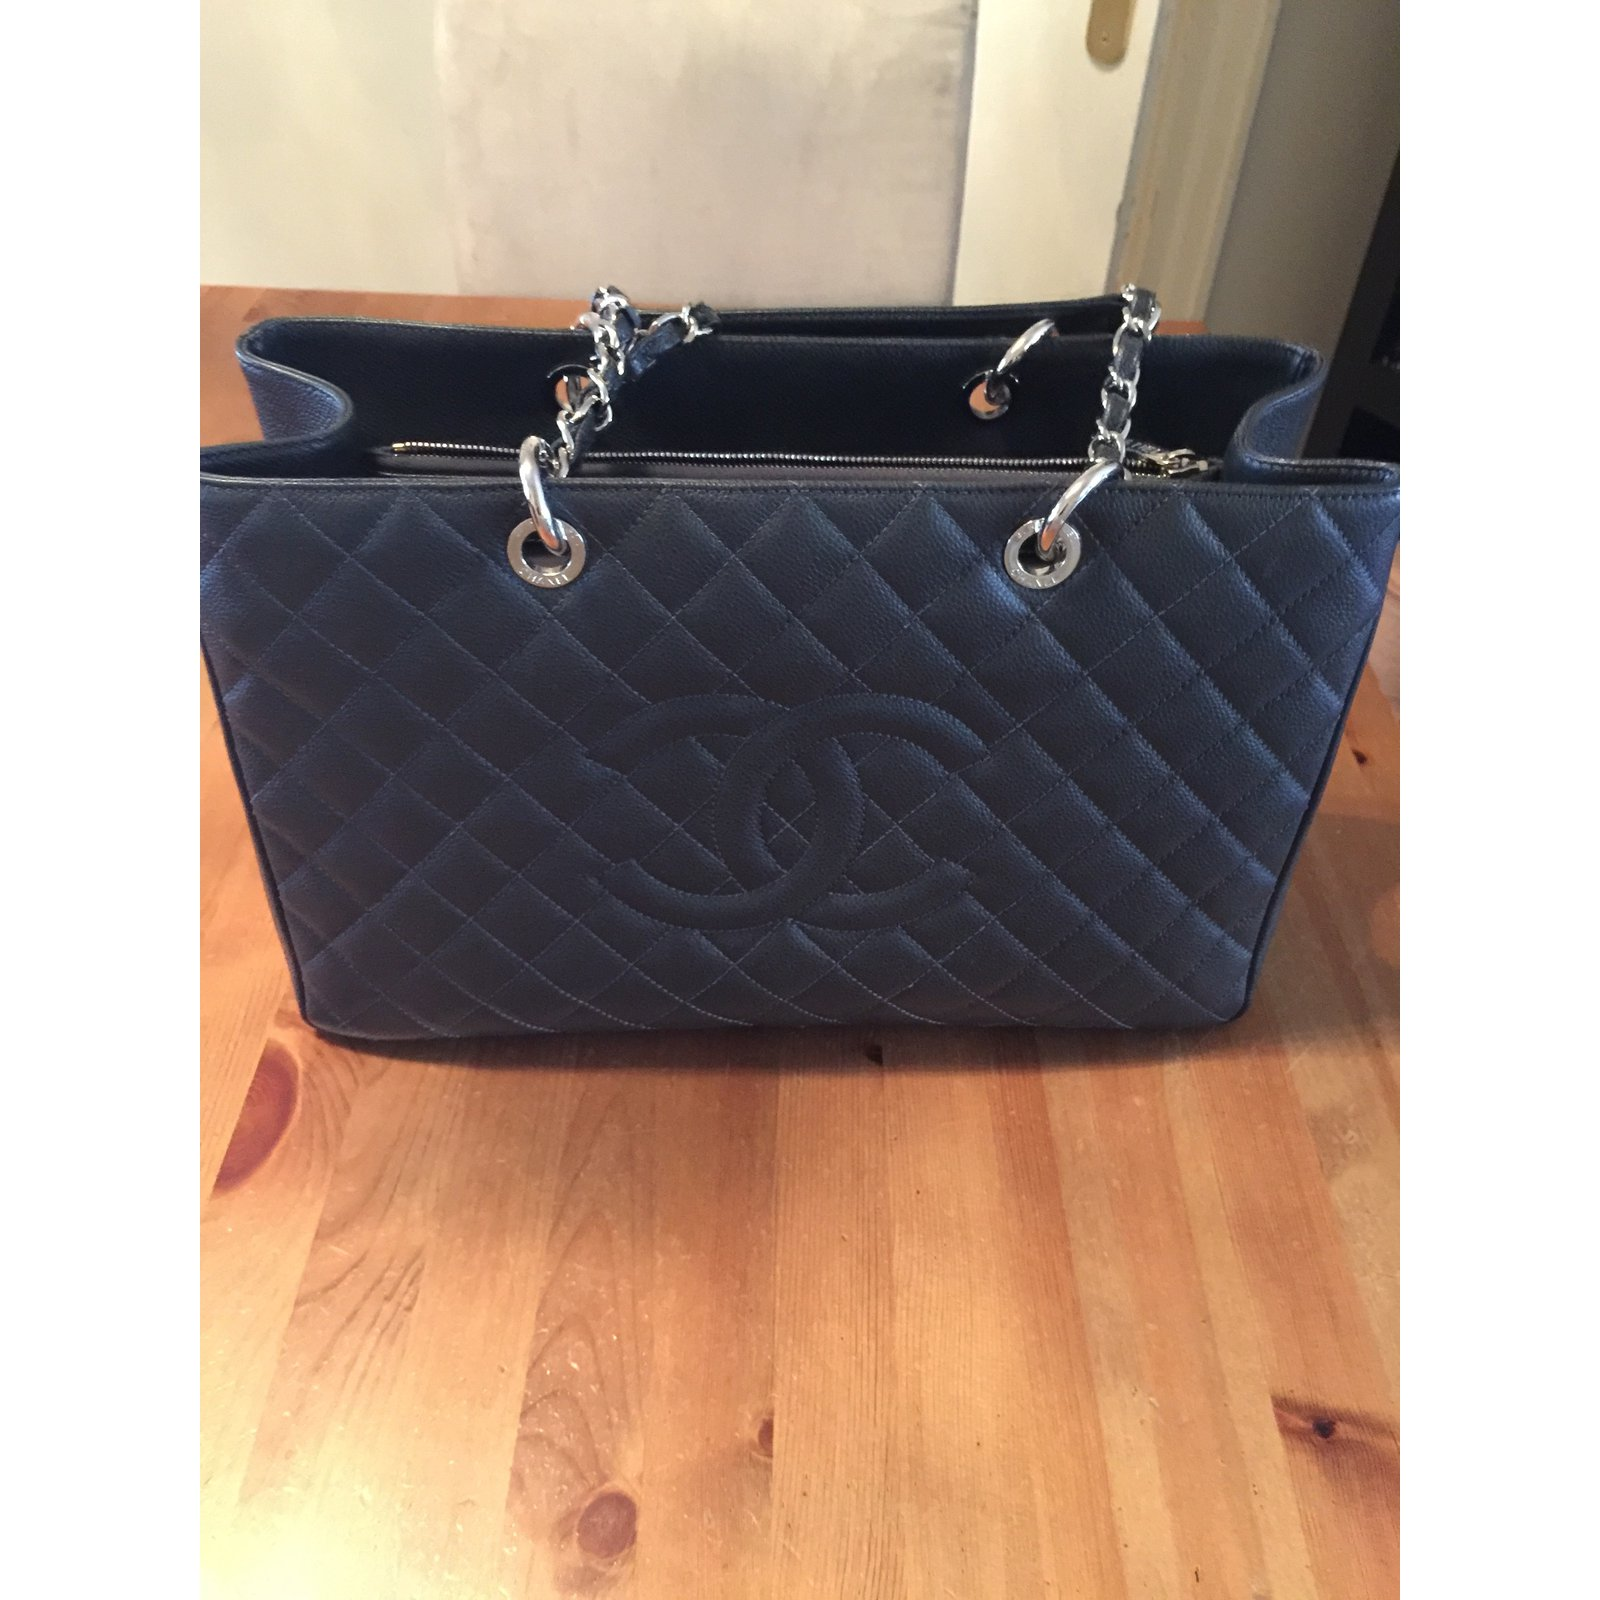 84ea82b5532b Chanel GST Totes Leather Dark grey ref.39011 - Joli Closet